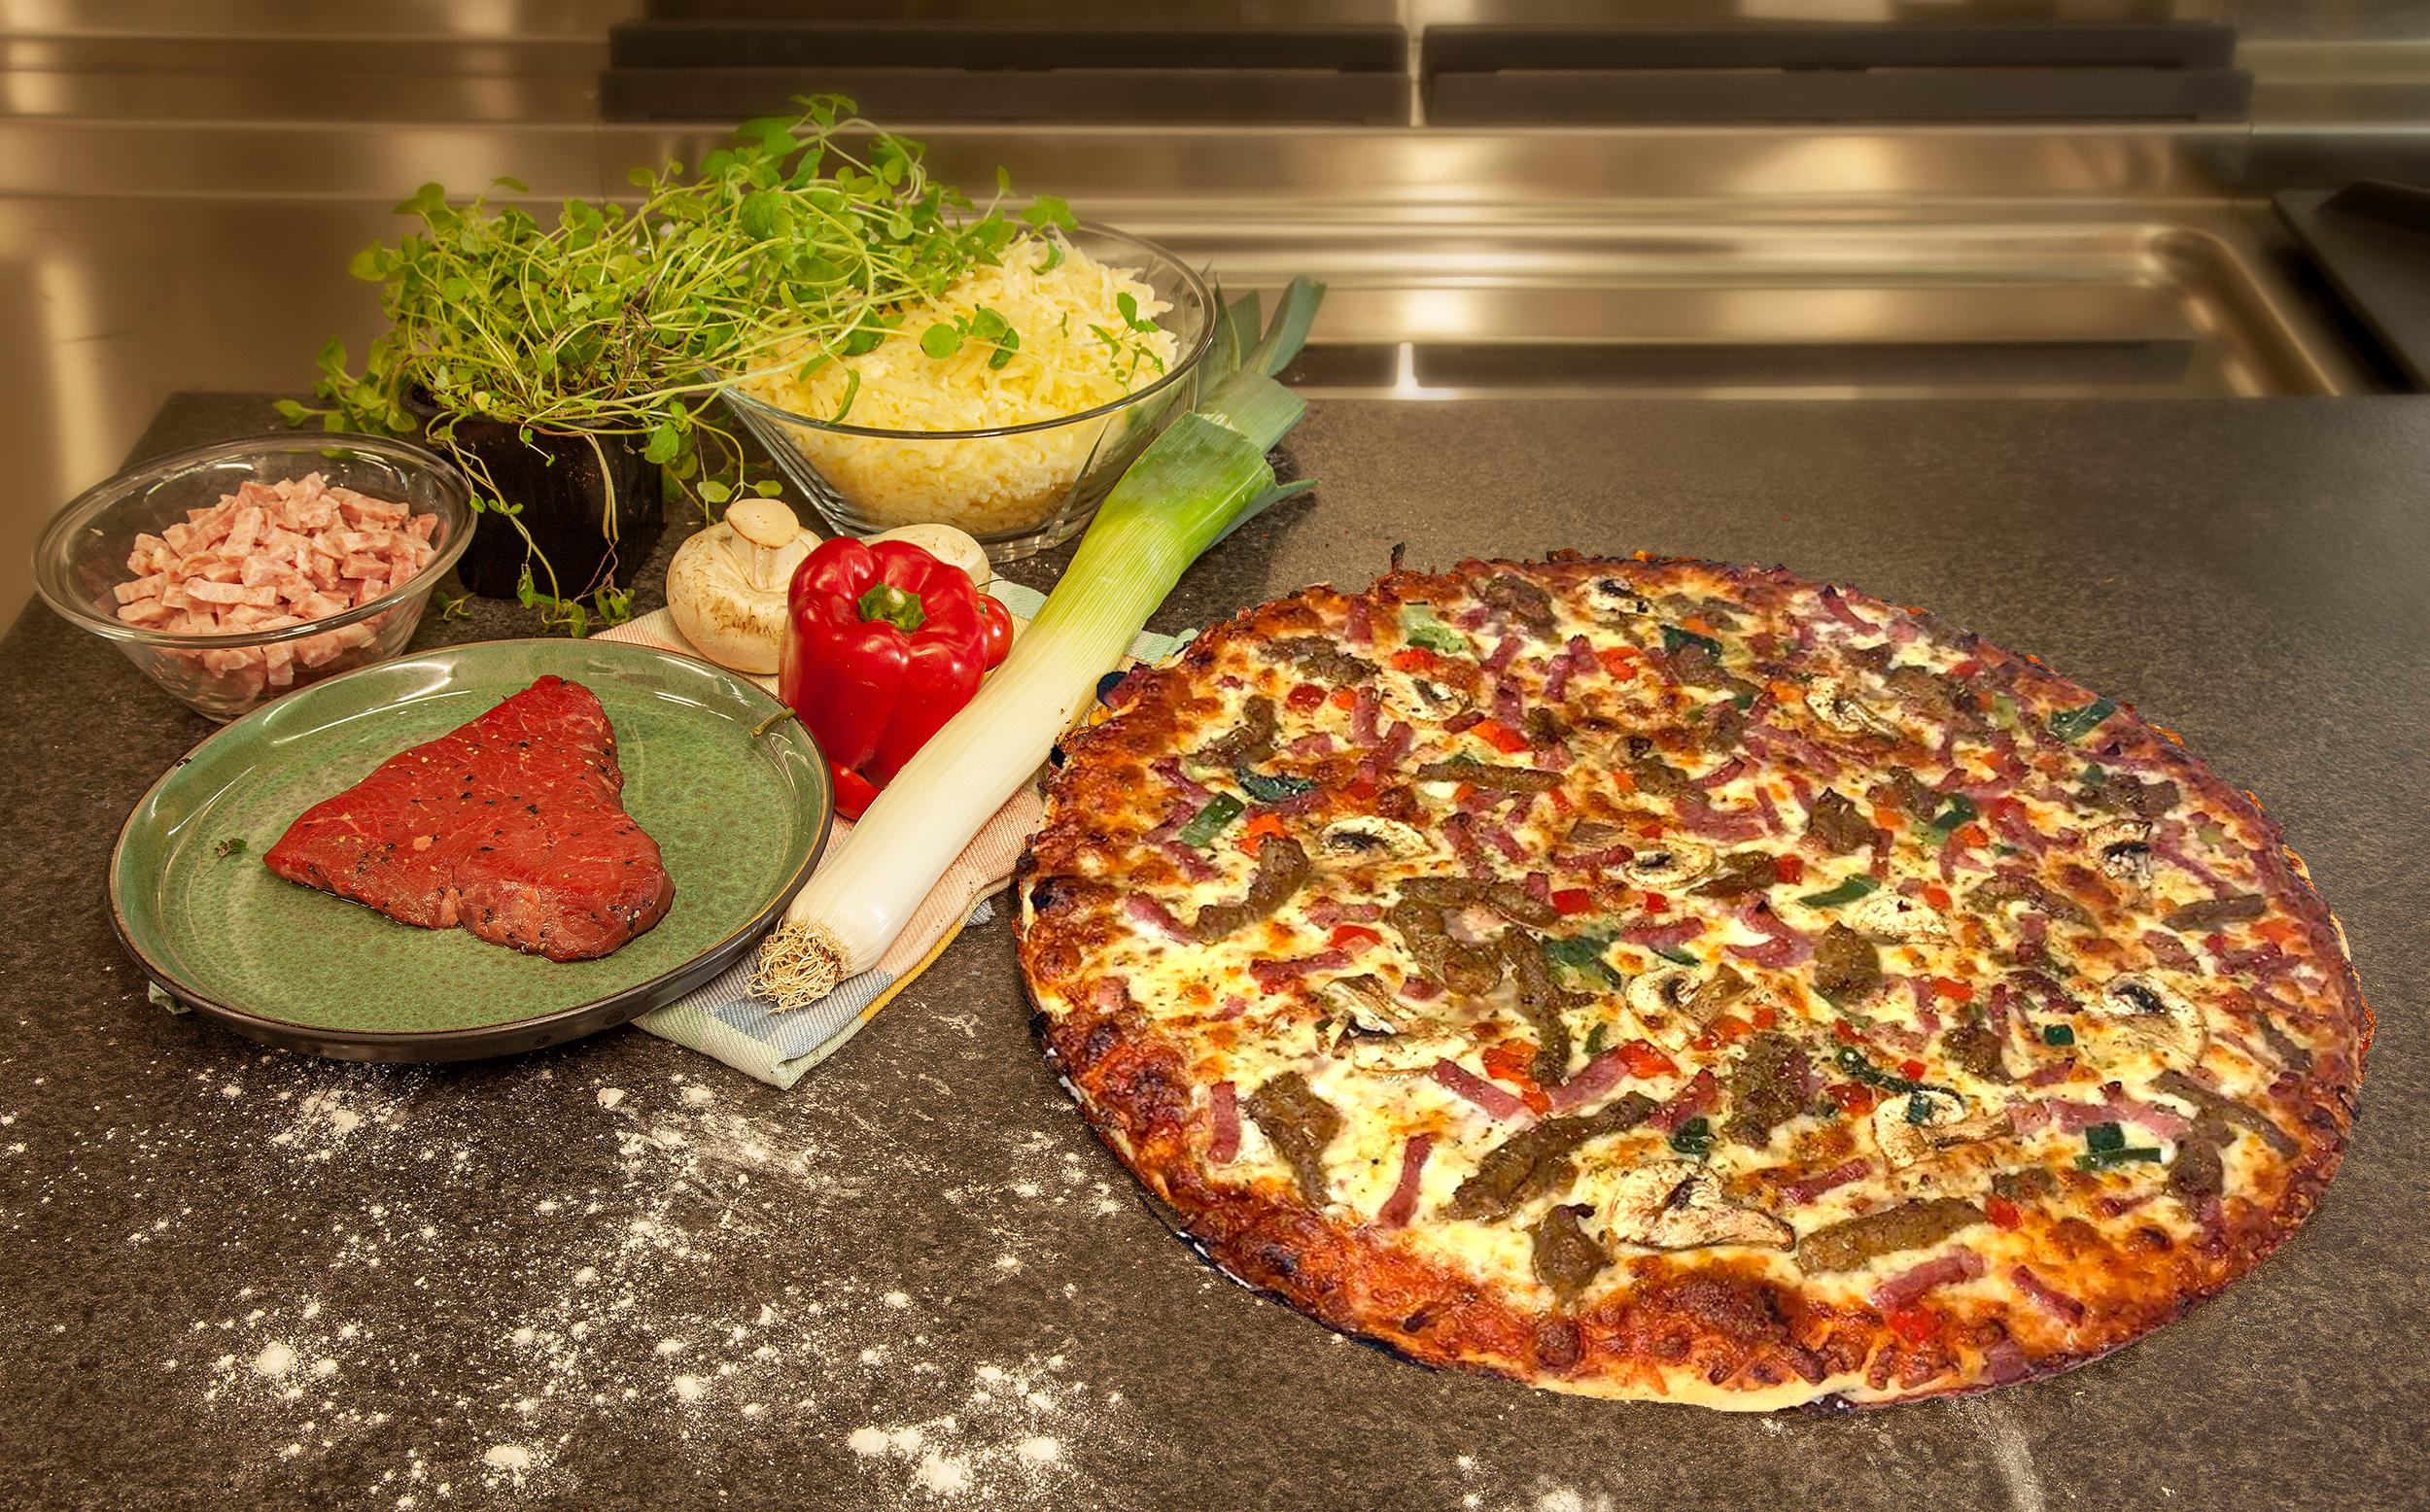 5. Pizza á la Burre